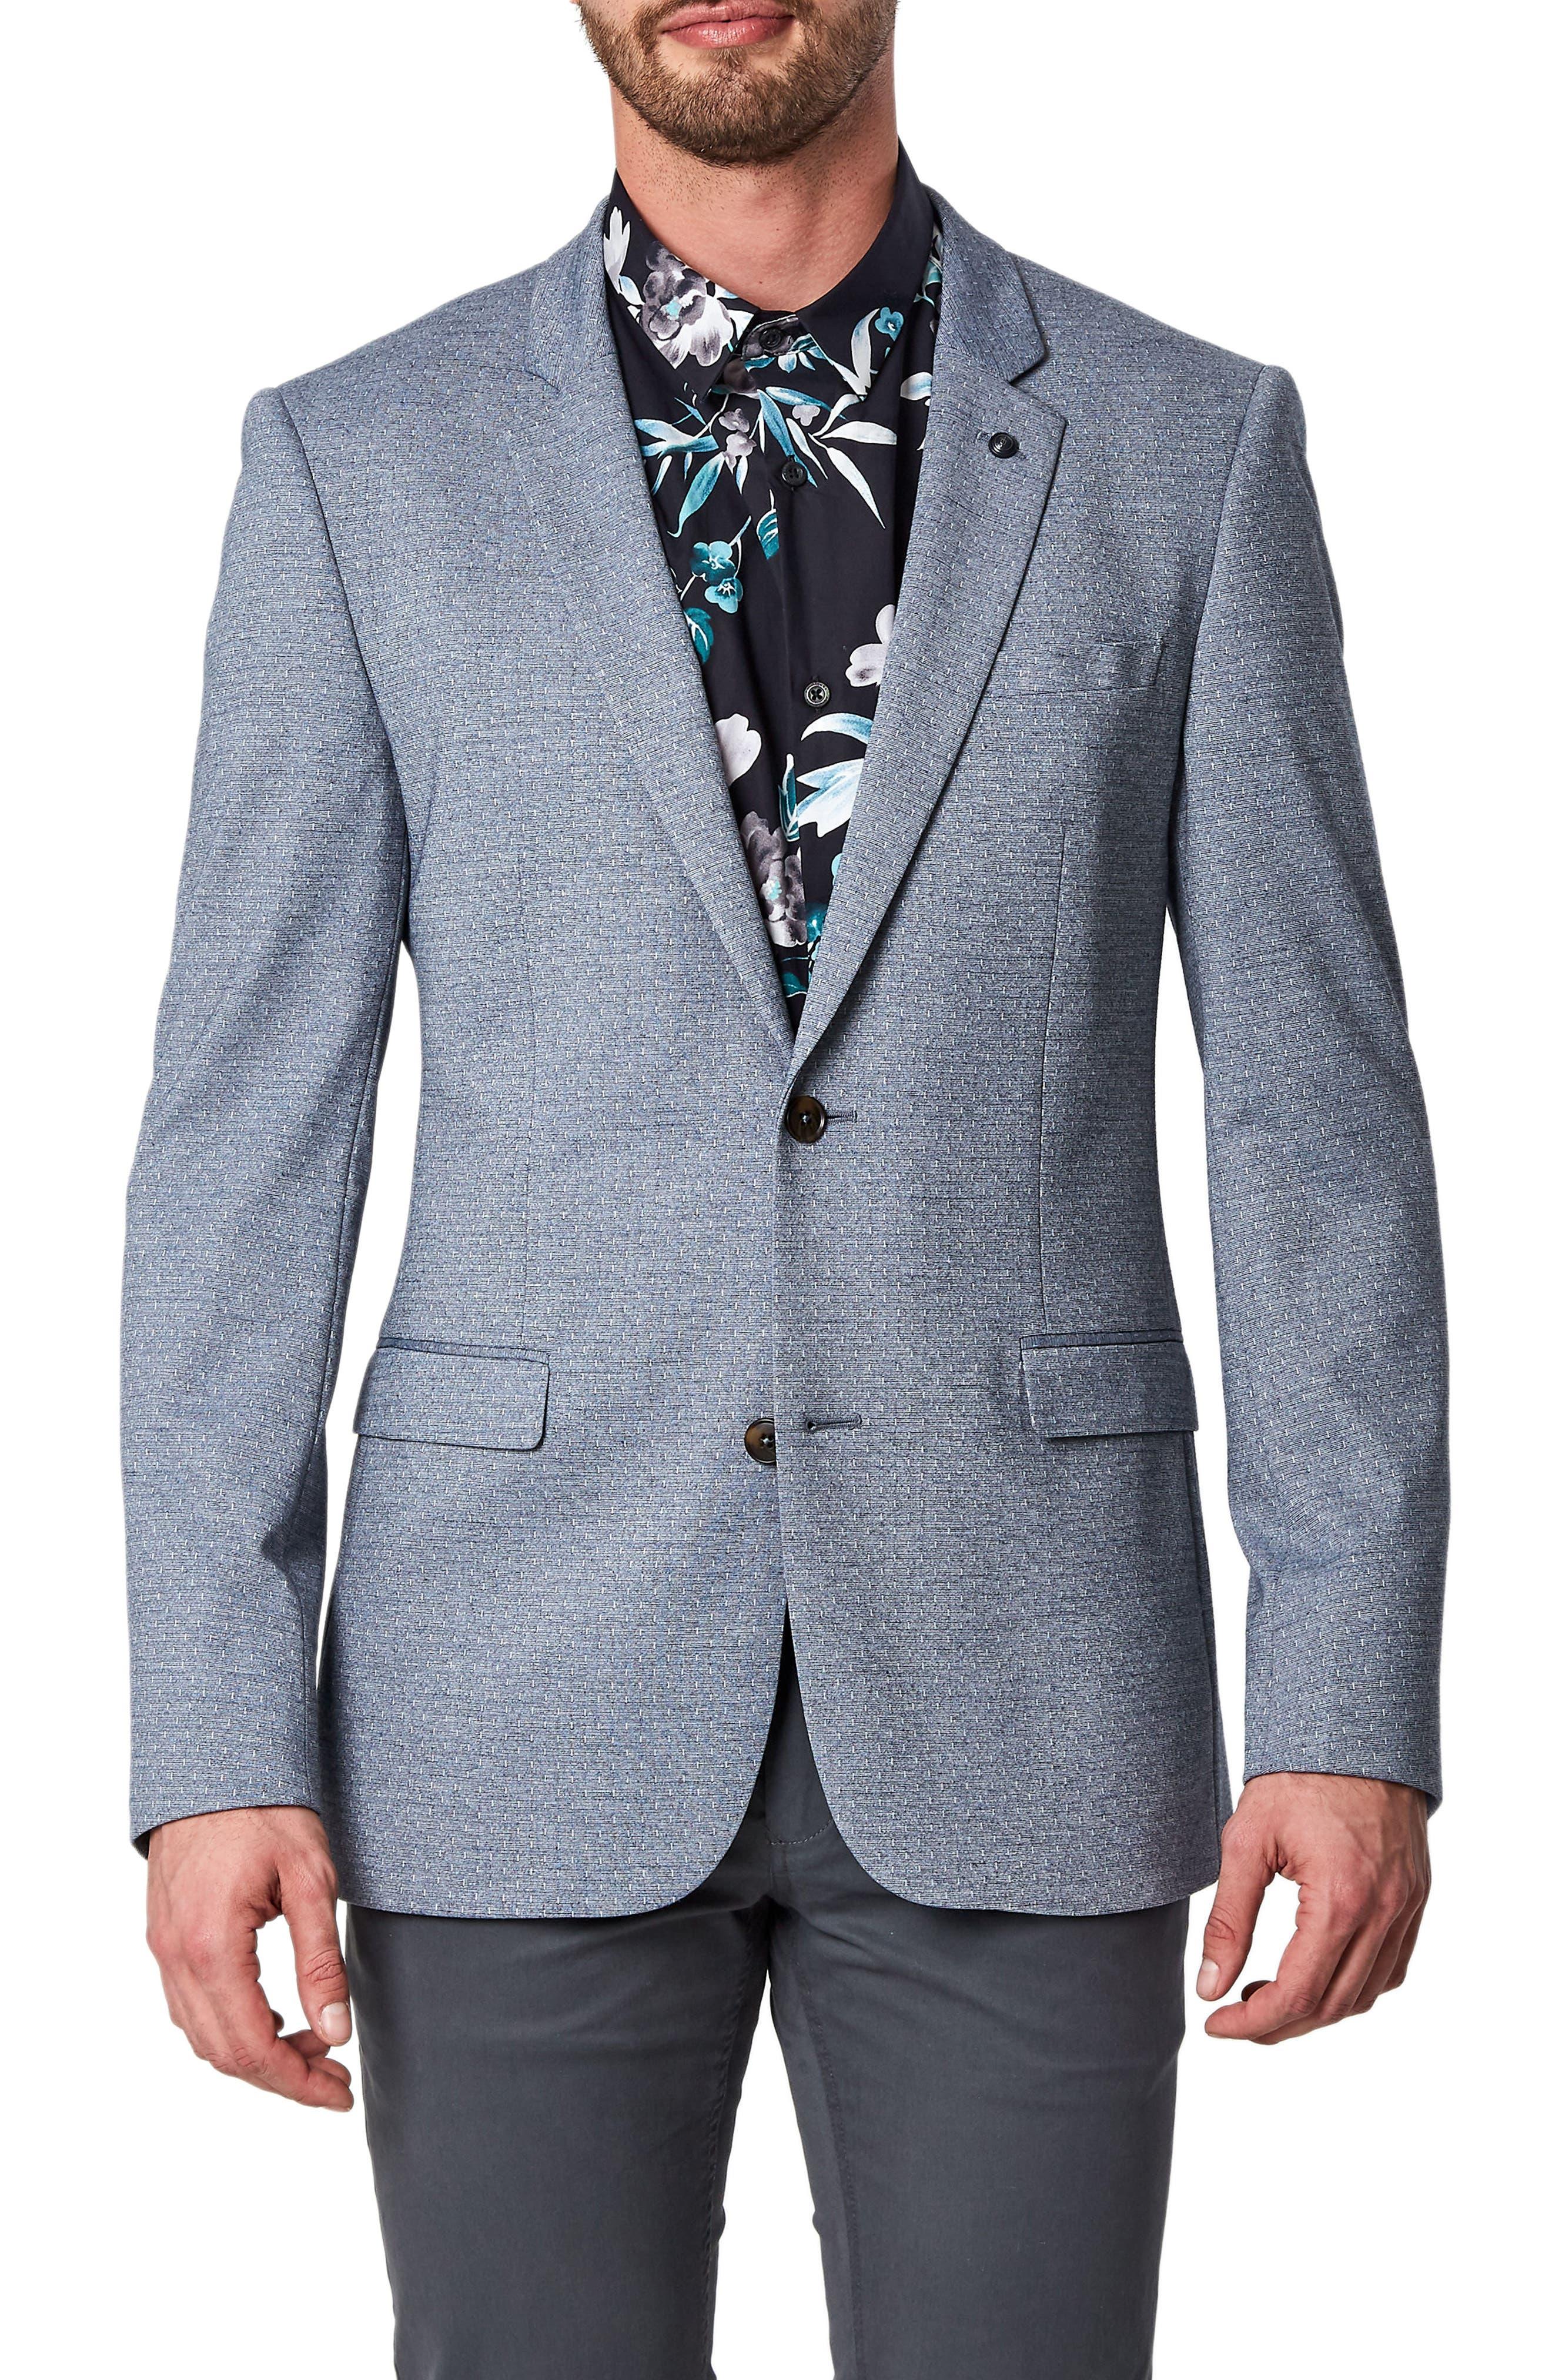 Felico Trim Fit Sport Coat,                         Main,                         color, Navy